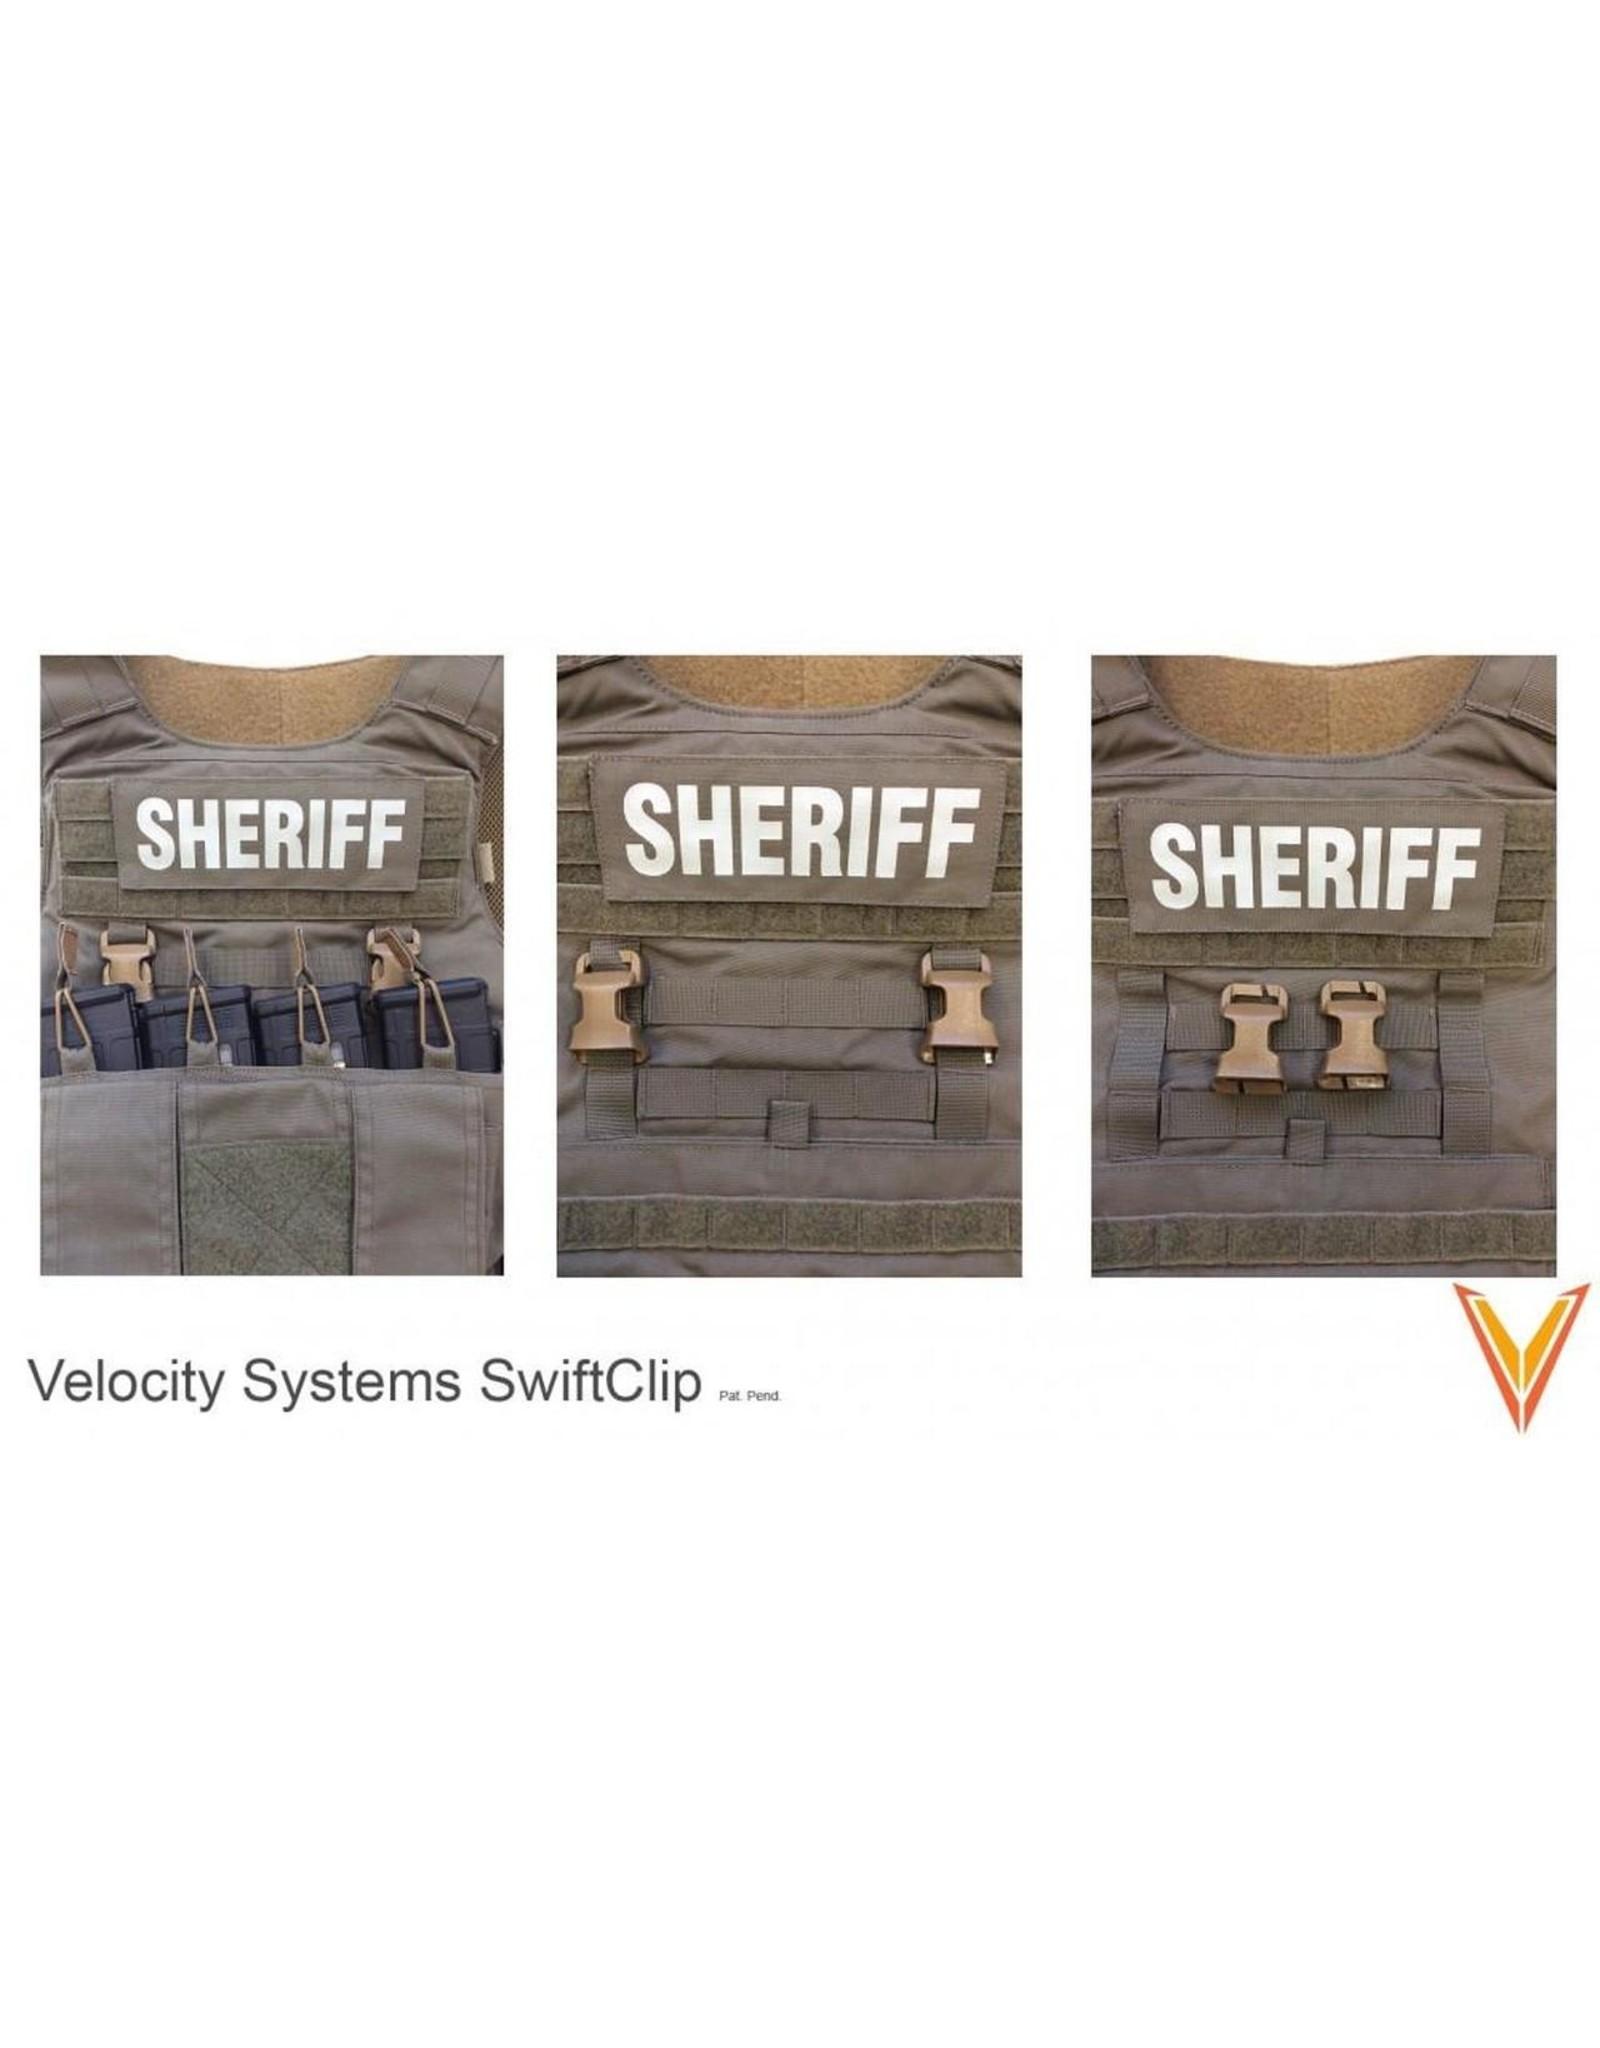 VELOCITY SYSTEMS VELOCITY SYSTEMS SWIFTCLIP